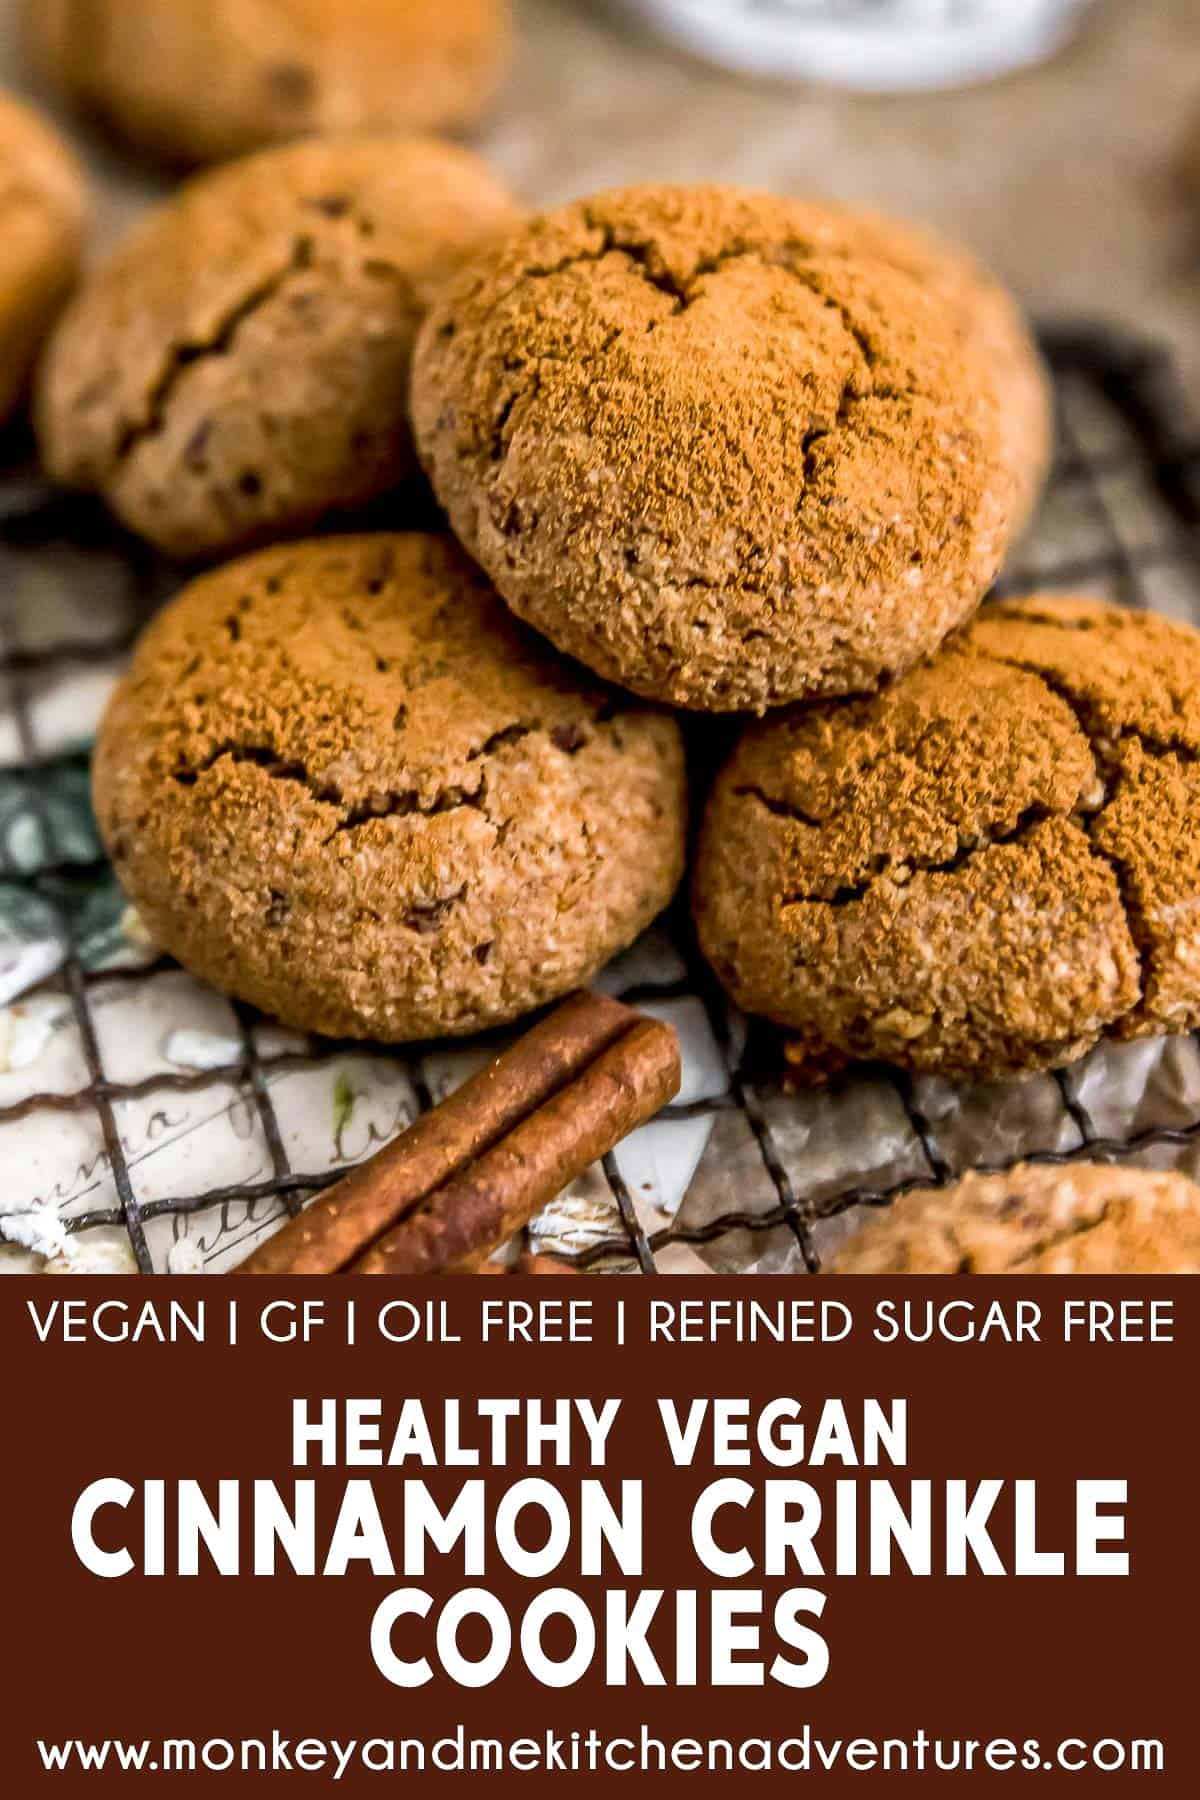 Healthy Vegan Cinnamon Crinkle Cookies with text description